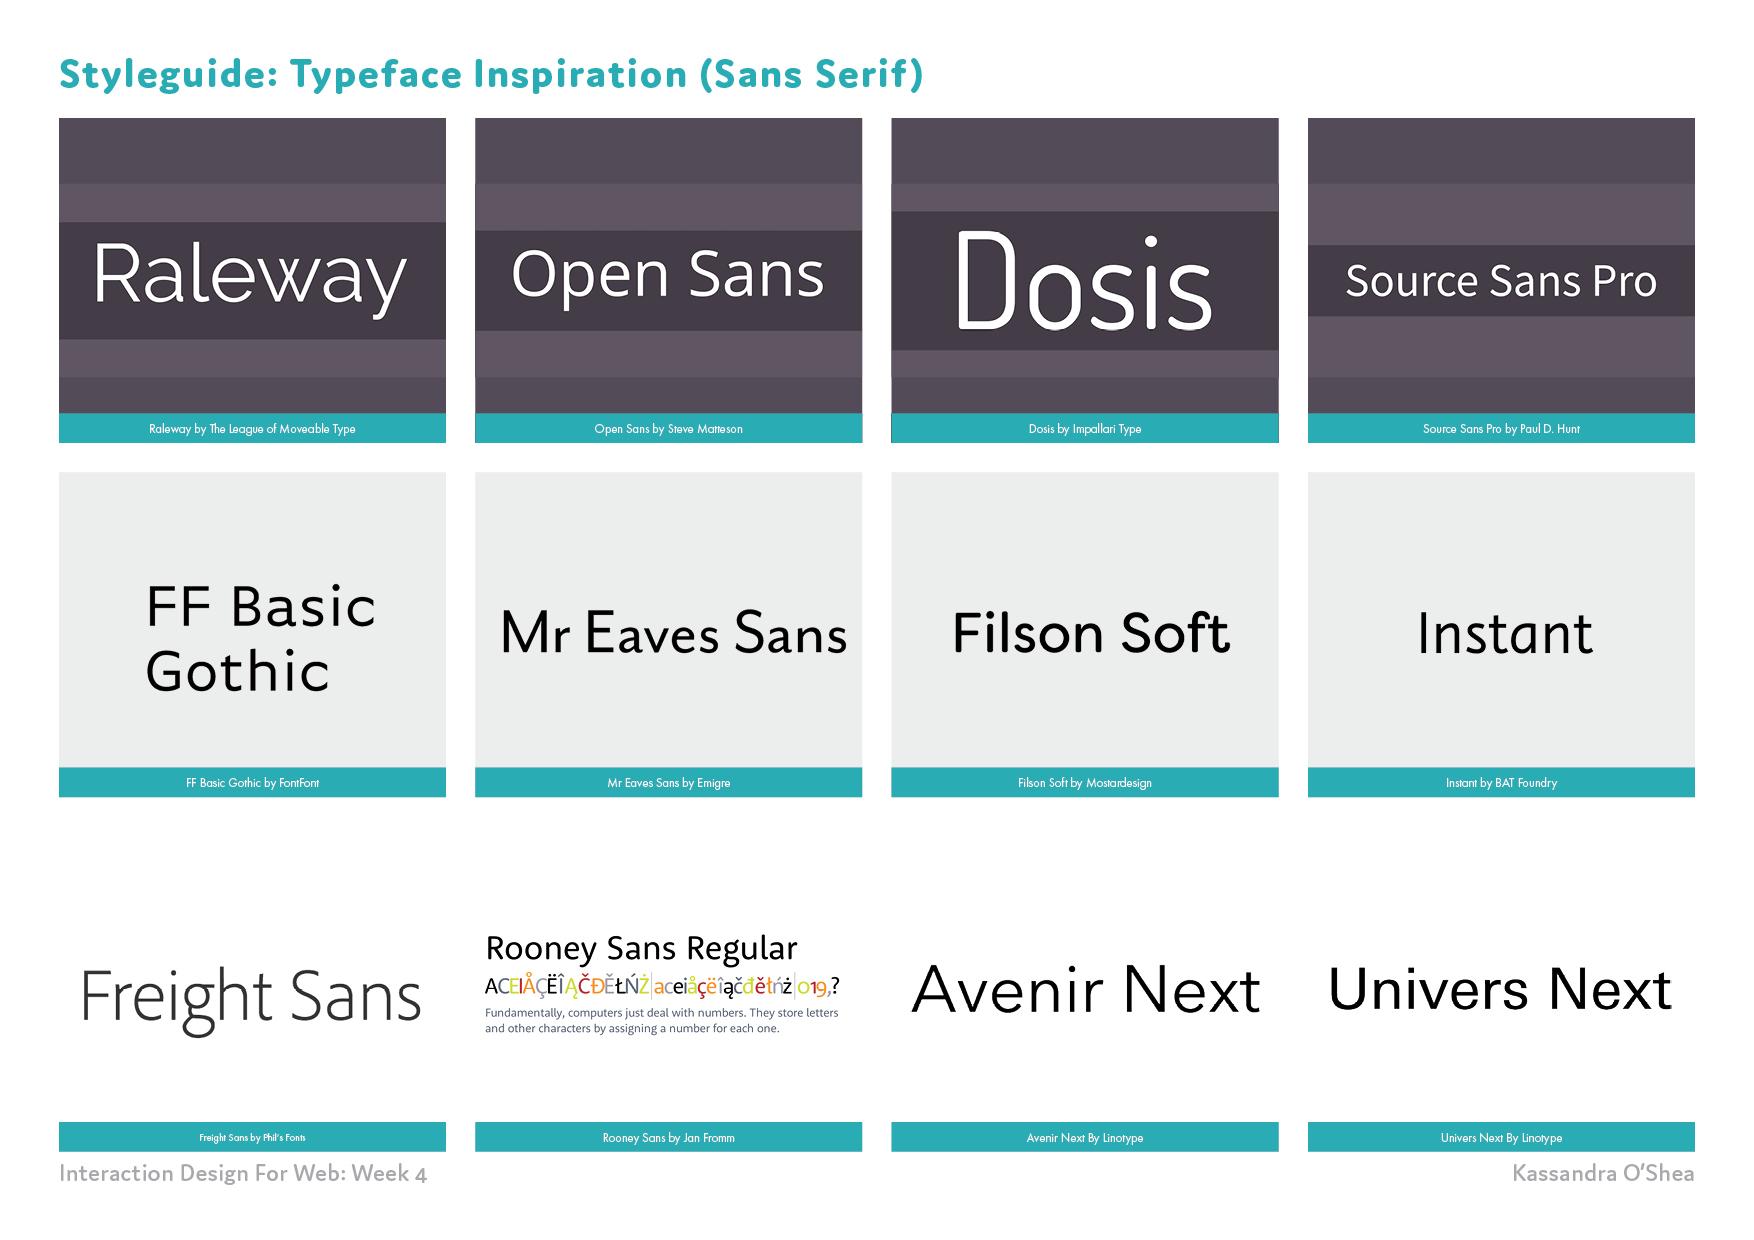 Styleguide: Typeface Inspiration (Sans Serif)